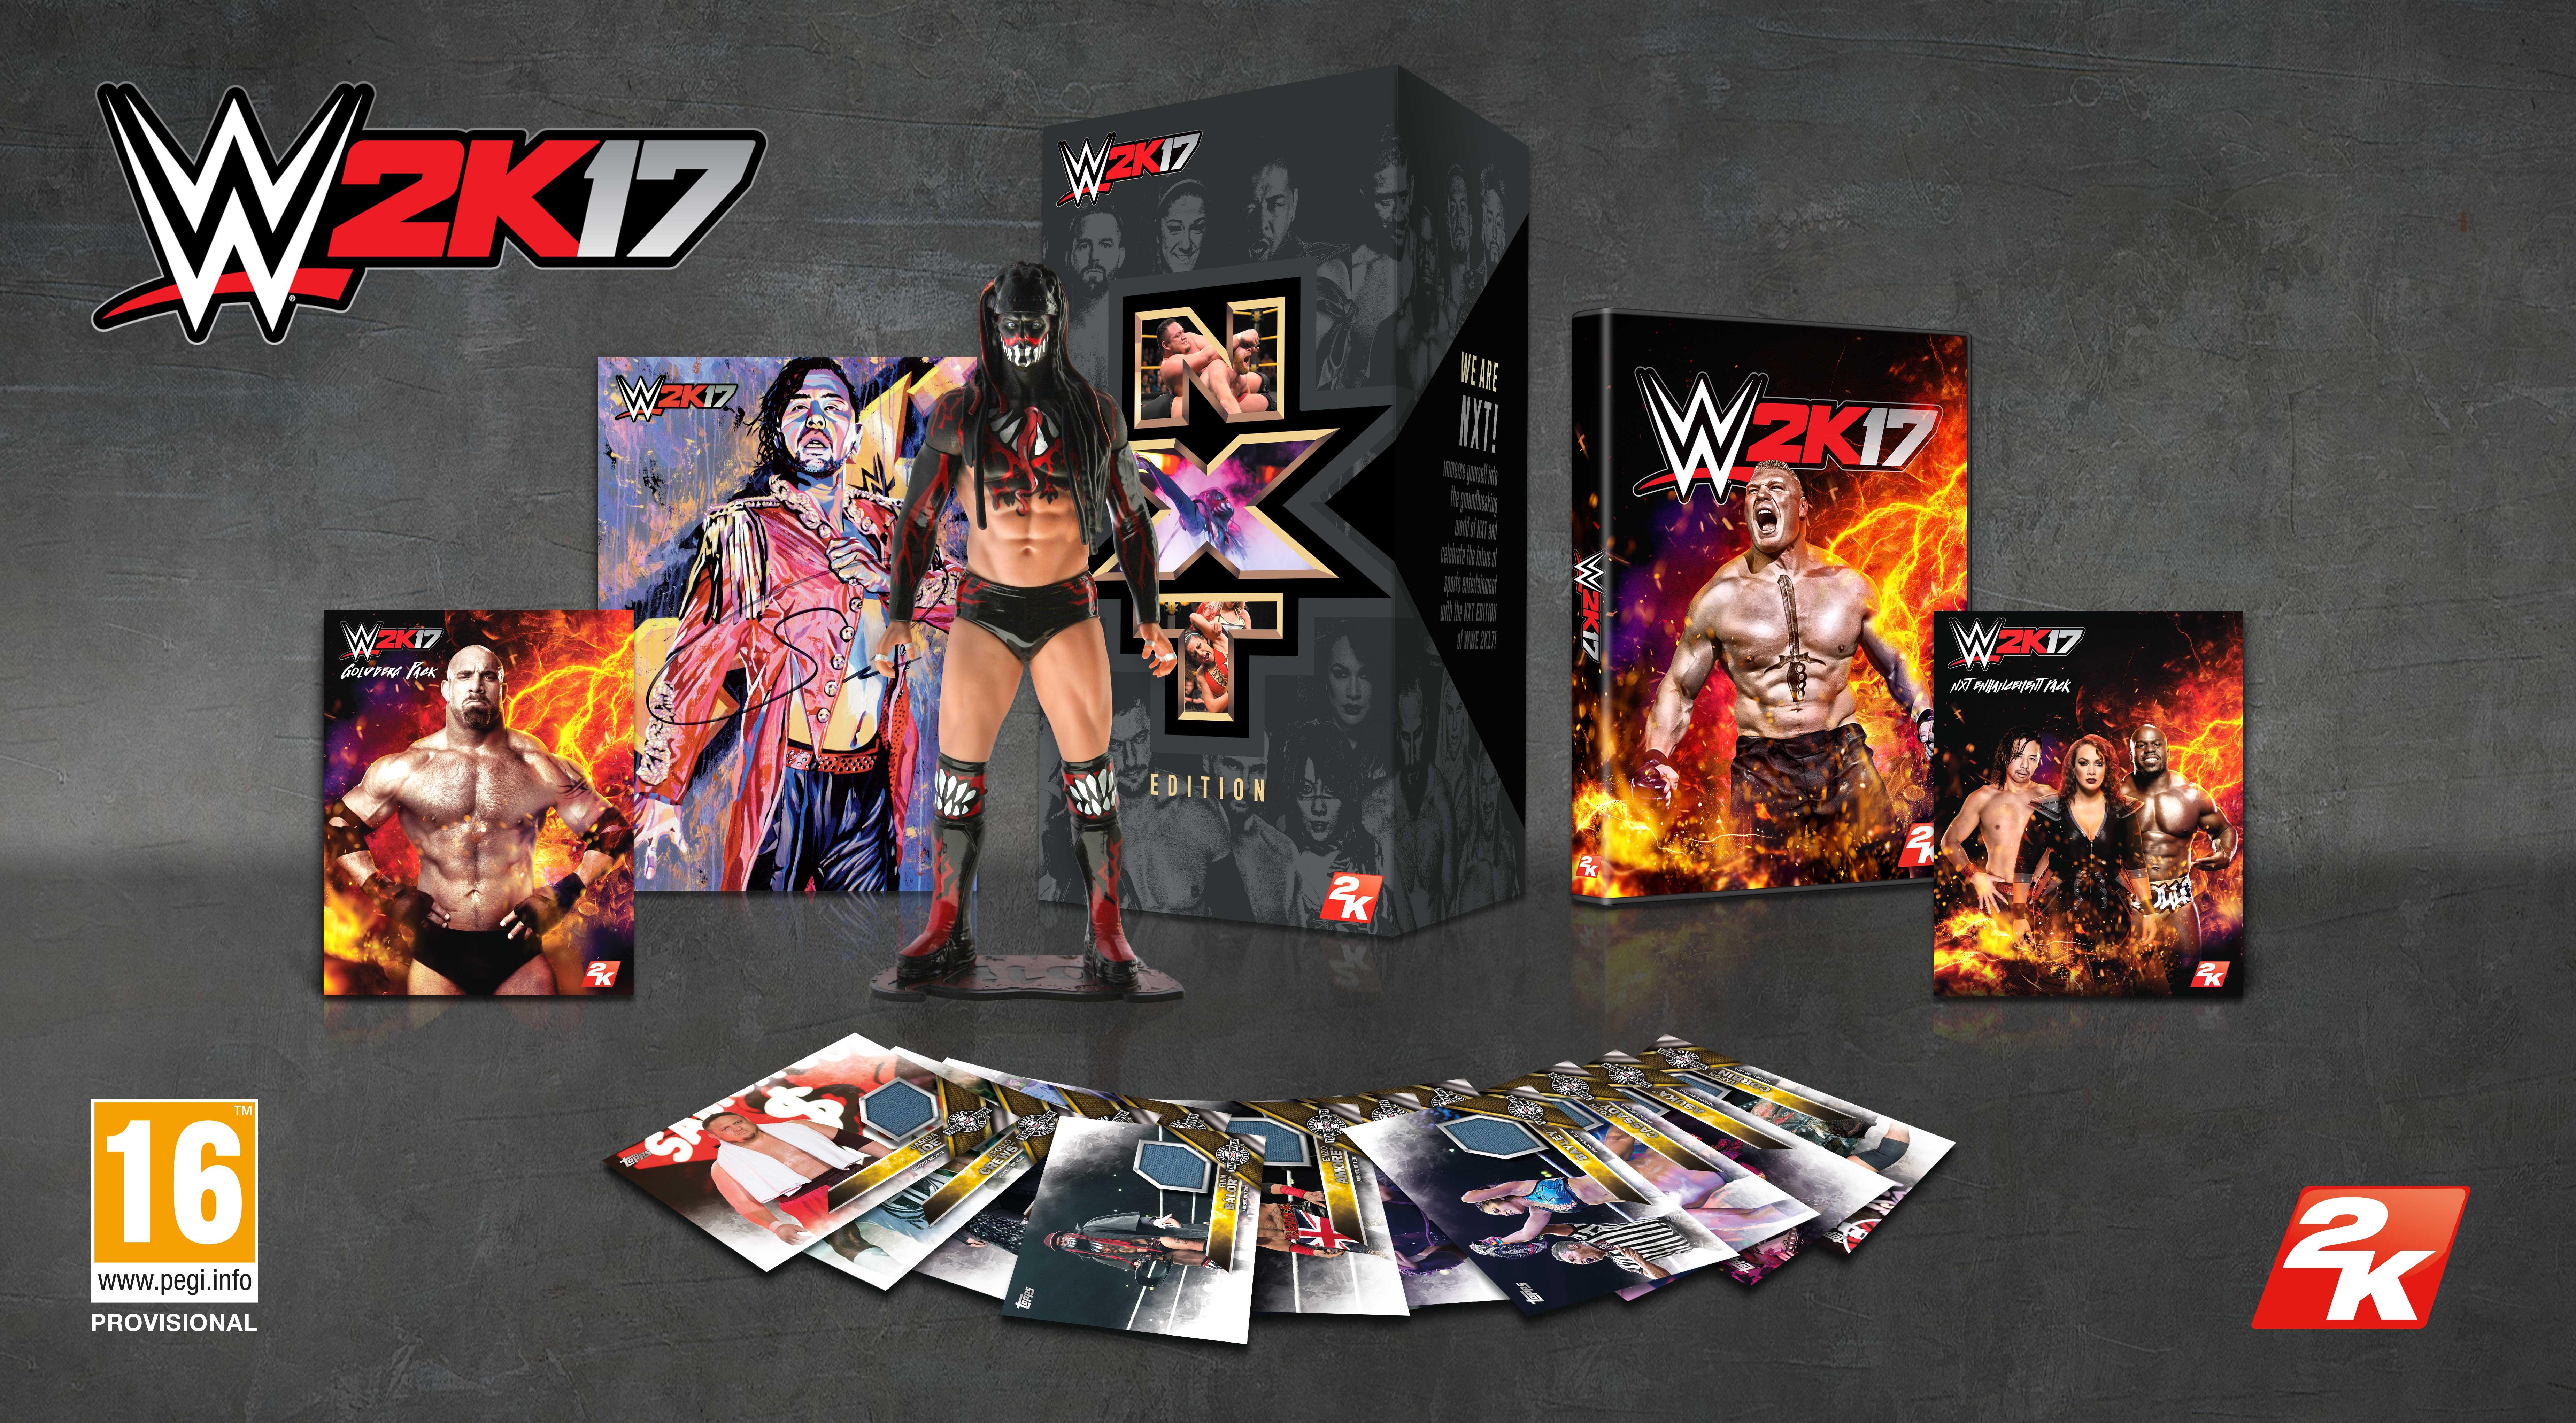 2KGMKT_WWE2K17_NXTEdition_BeautyShot_1920x1080-SPA